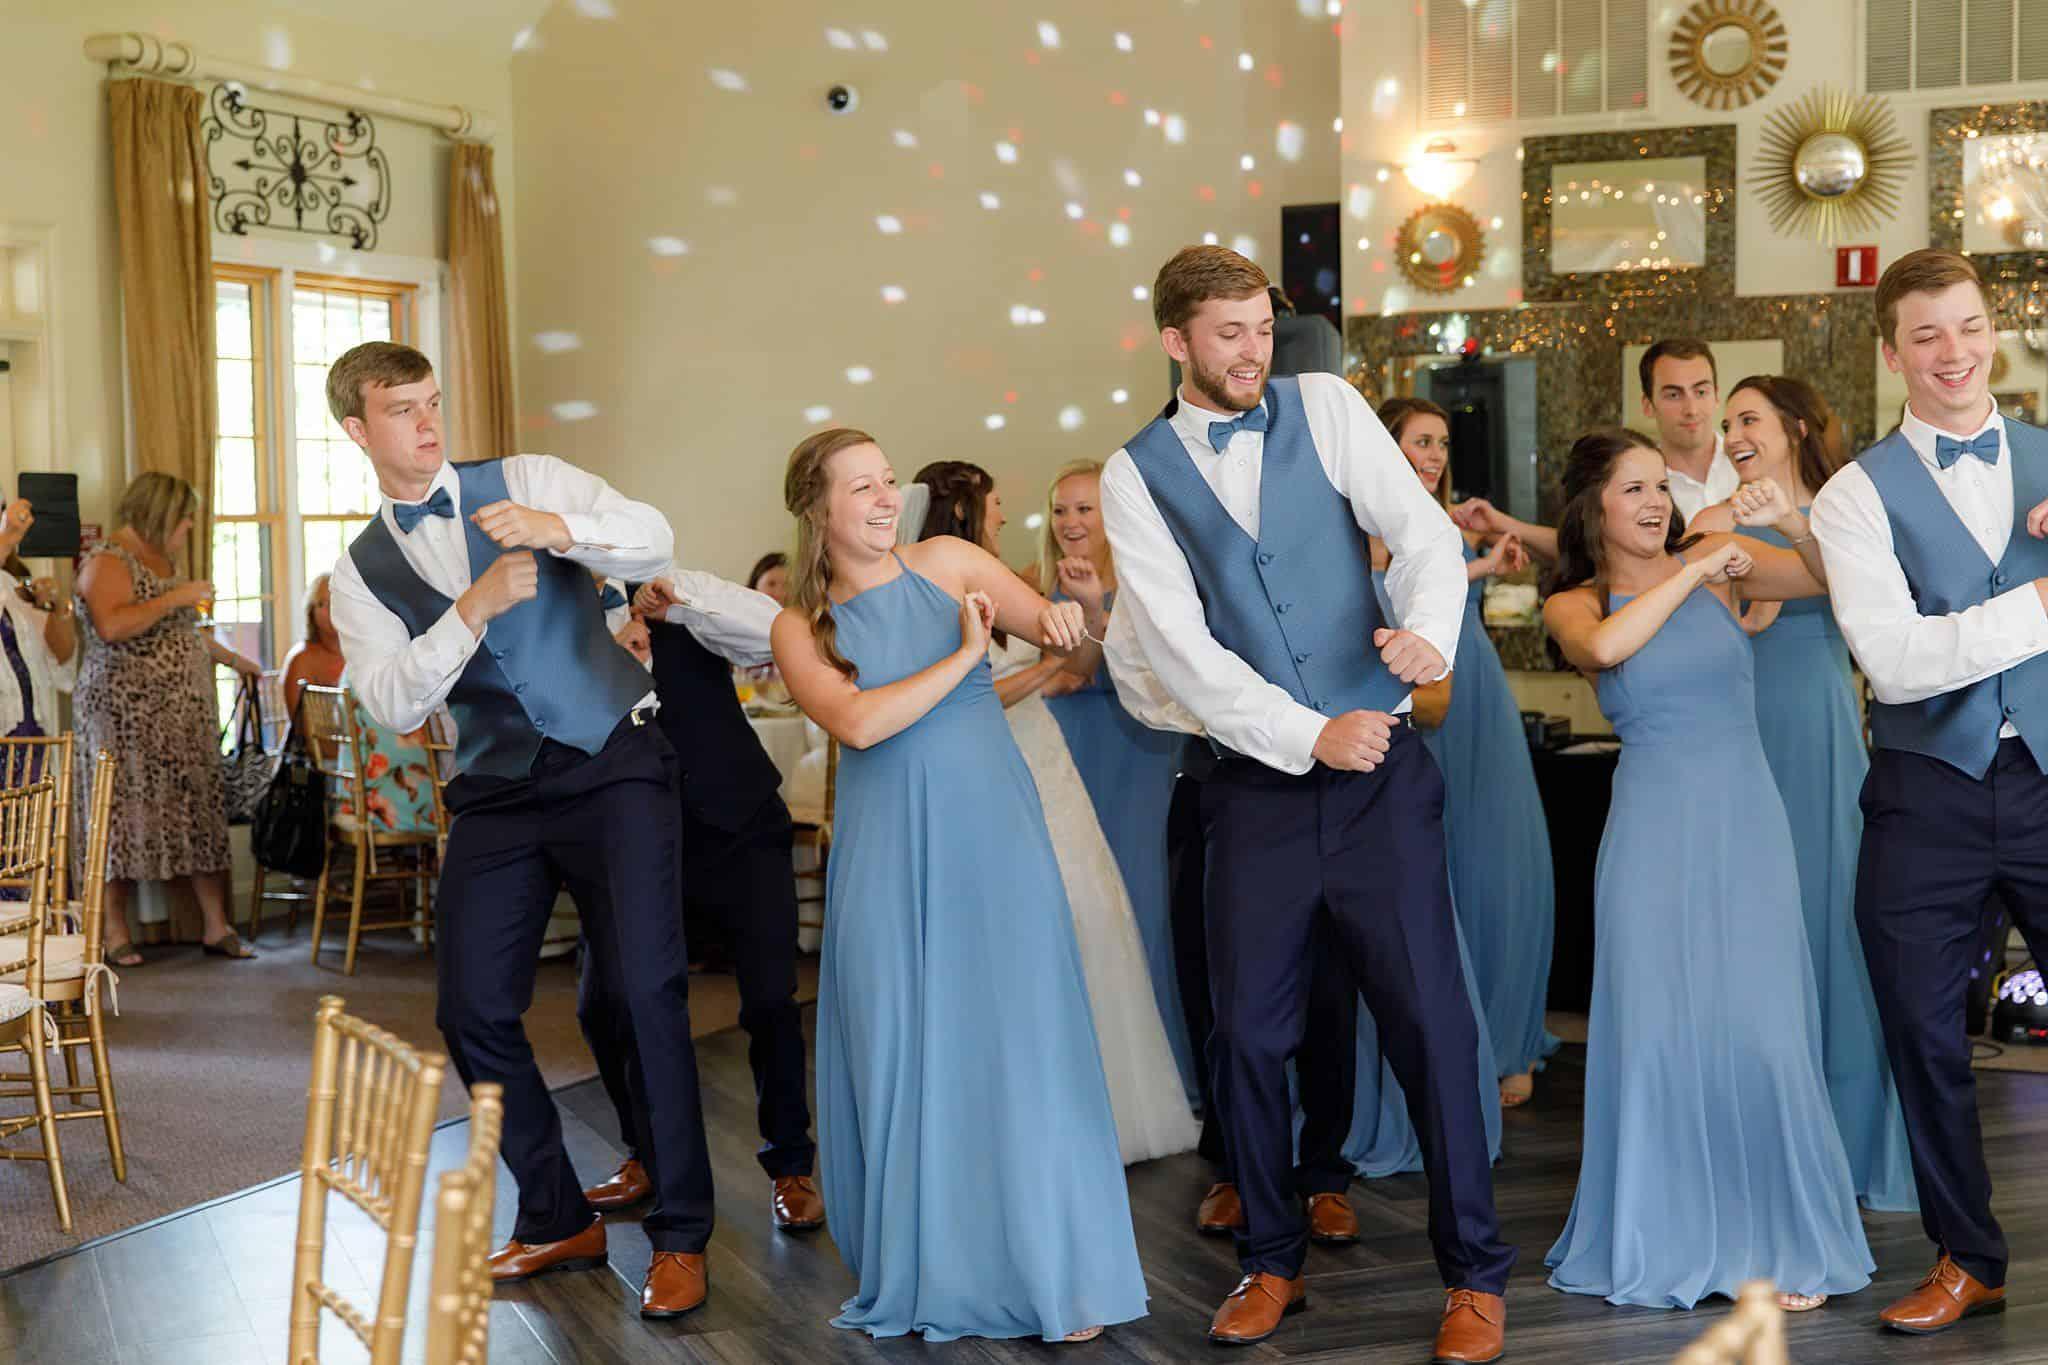 Bridesmaids and groomsmen dancing on dance floor at a wedding reception